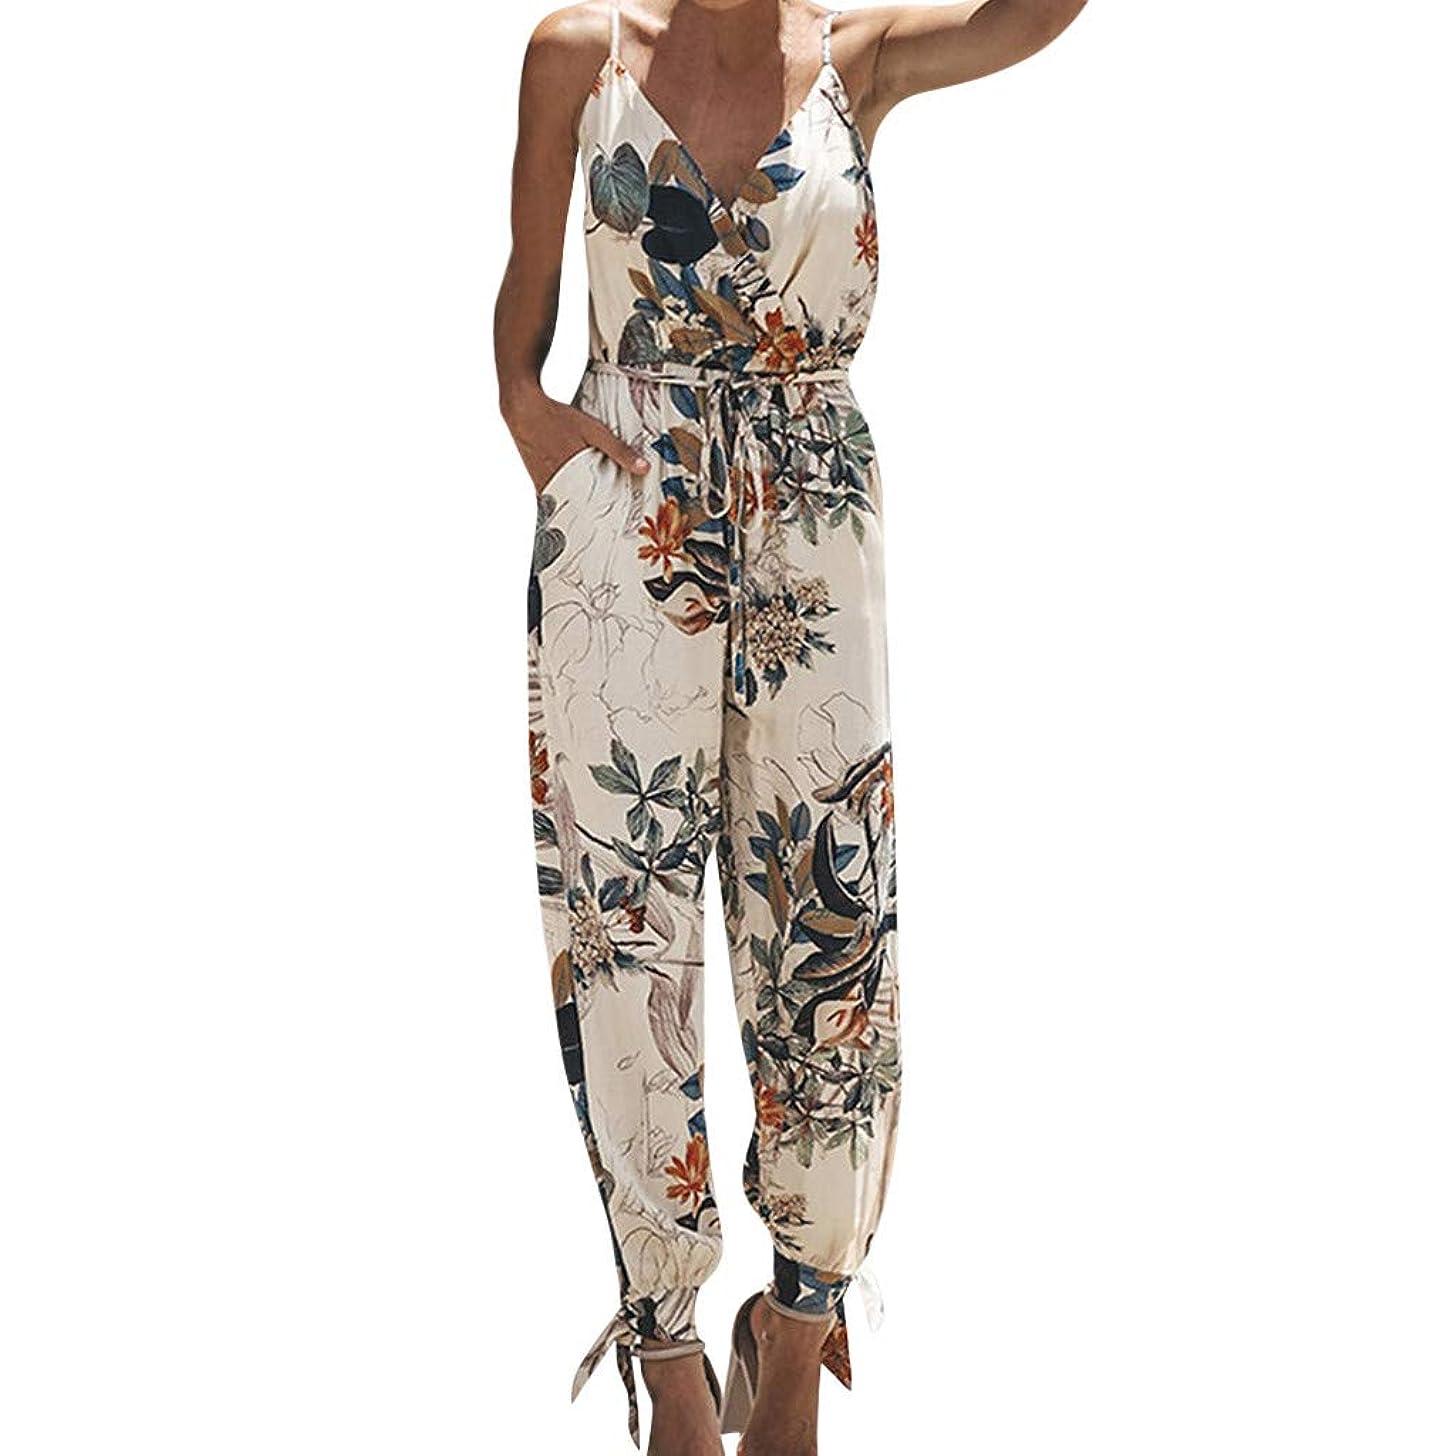 Women's V Neck Spaghetti Strap Drawstring Waisted Long Pants Jumpsuit Rompers Split Beam Foot Pants Playsuit Clubwear